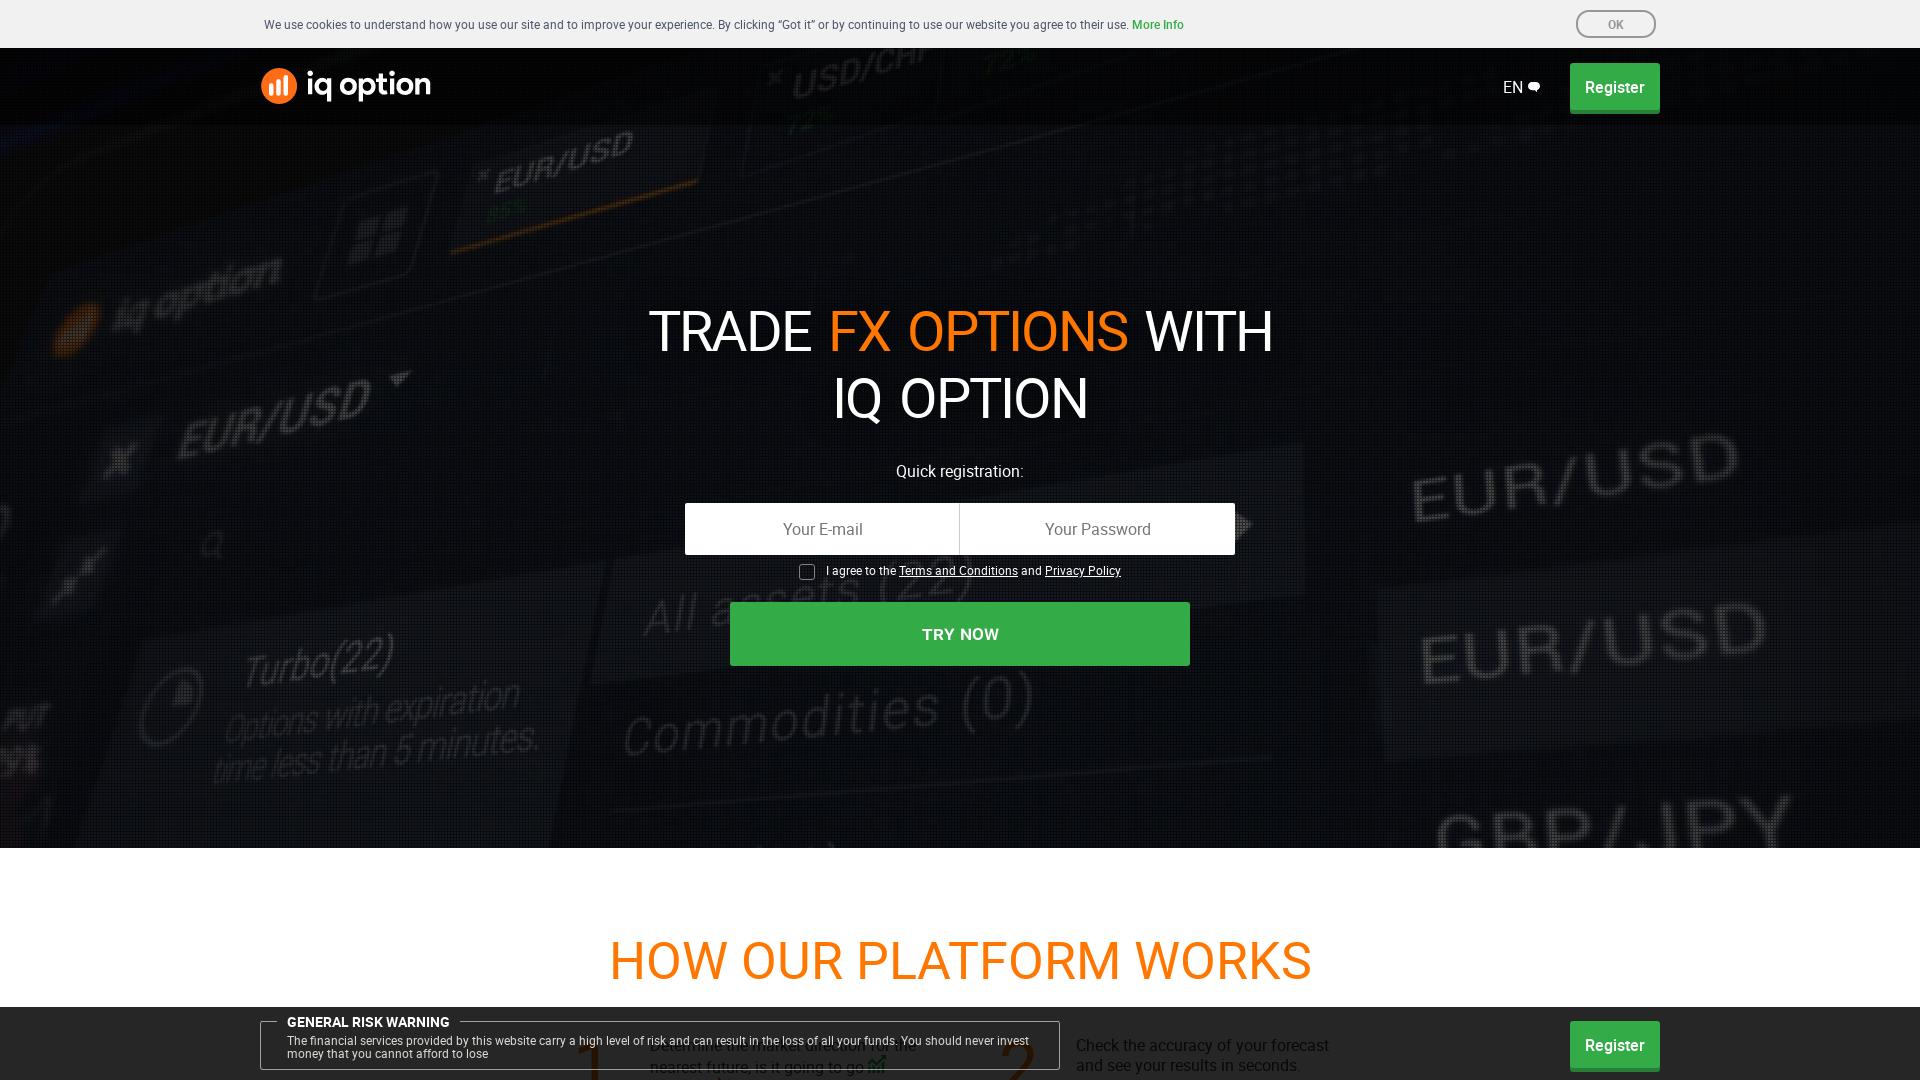 IQoption website